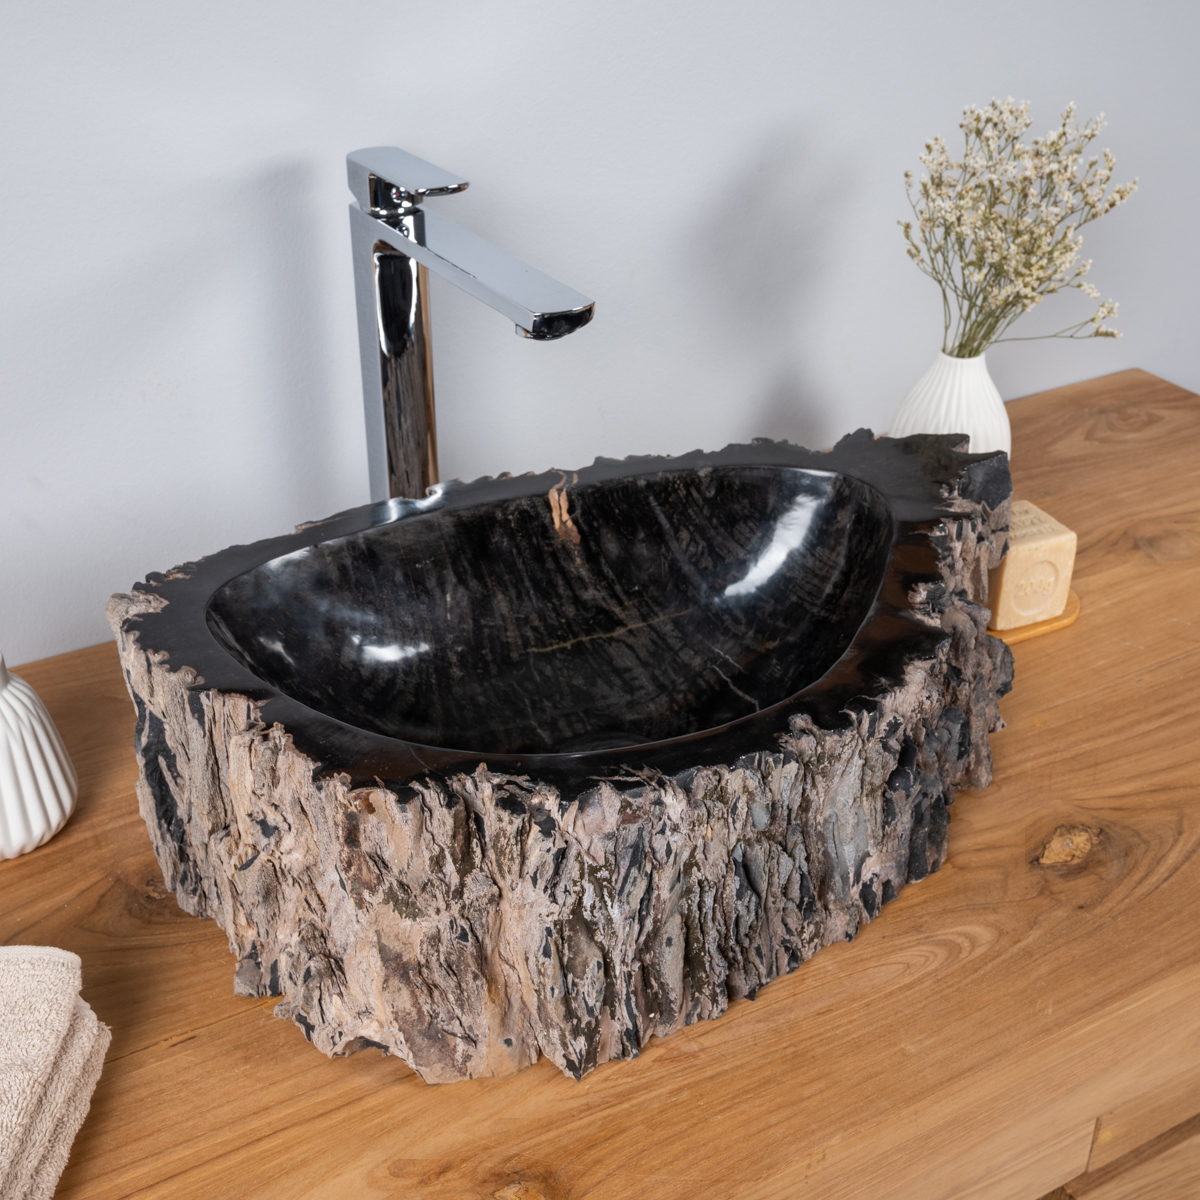 Vasque vasque poser bois p trifi fossilis l 53 cm x p 38 cm 3829 - Vasque salle de bain bois ...